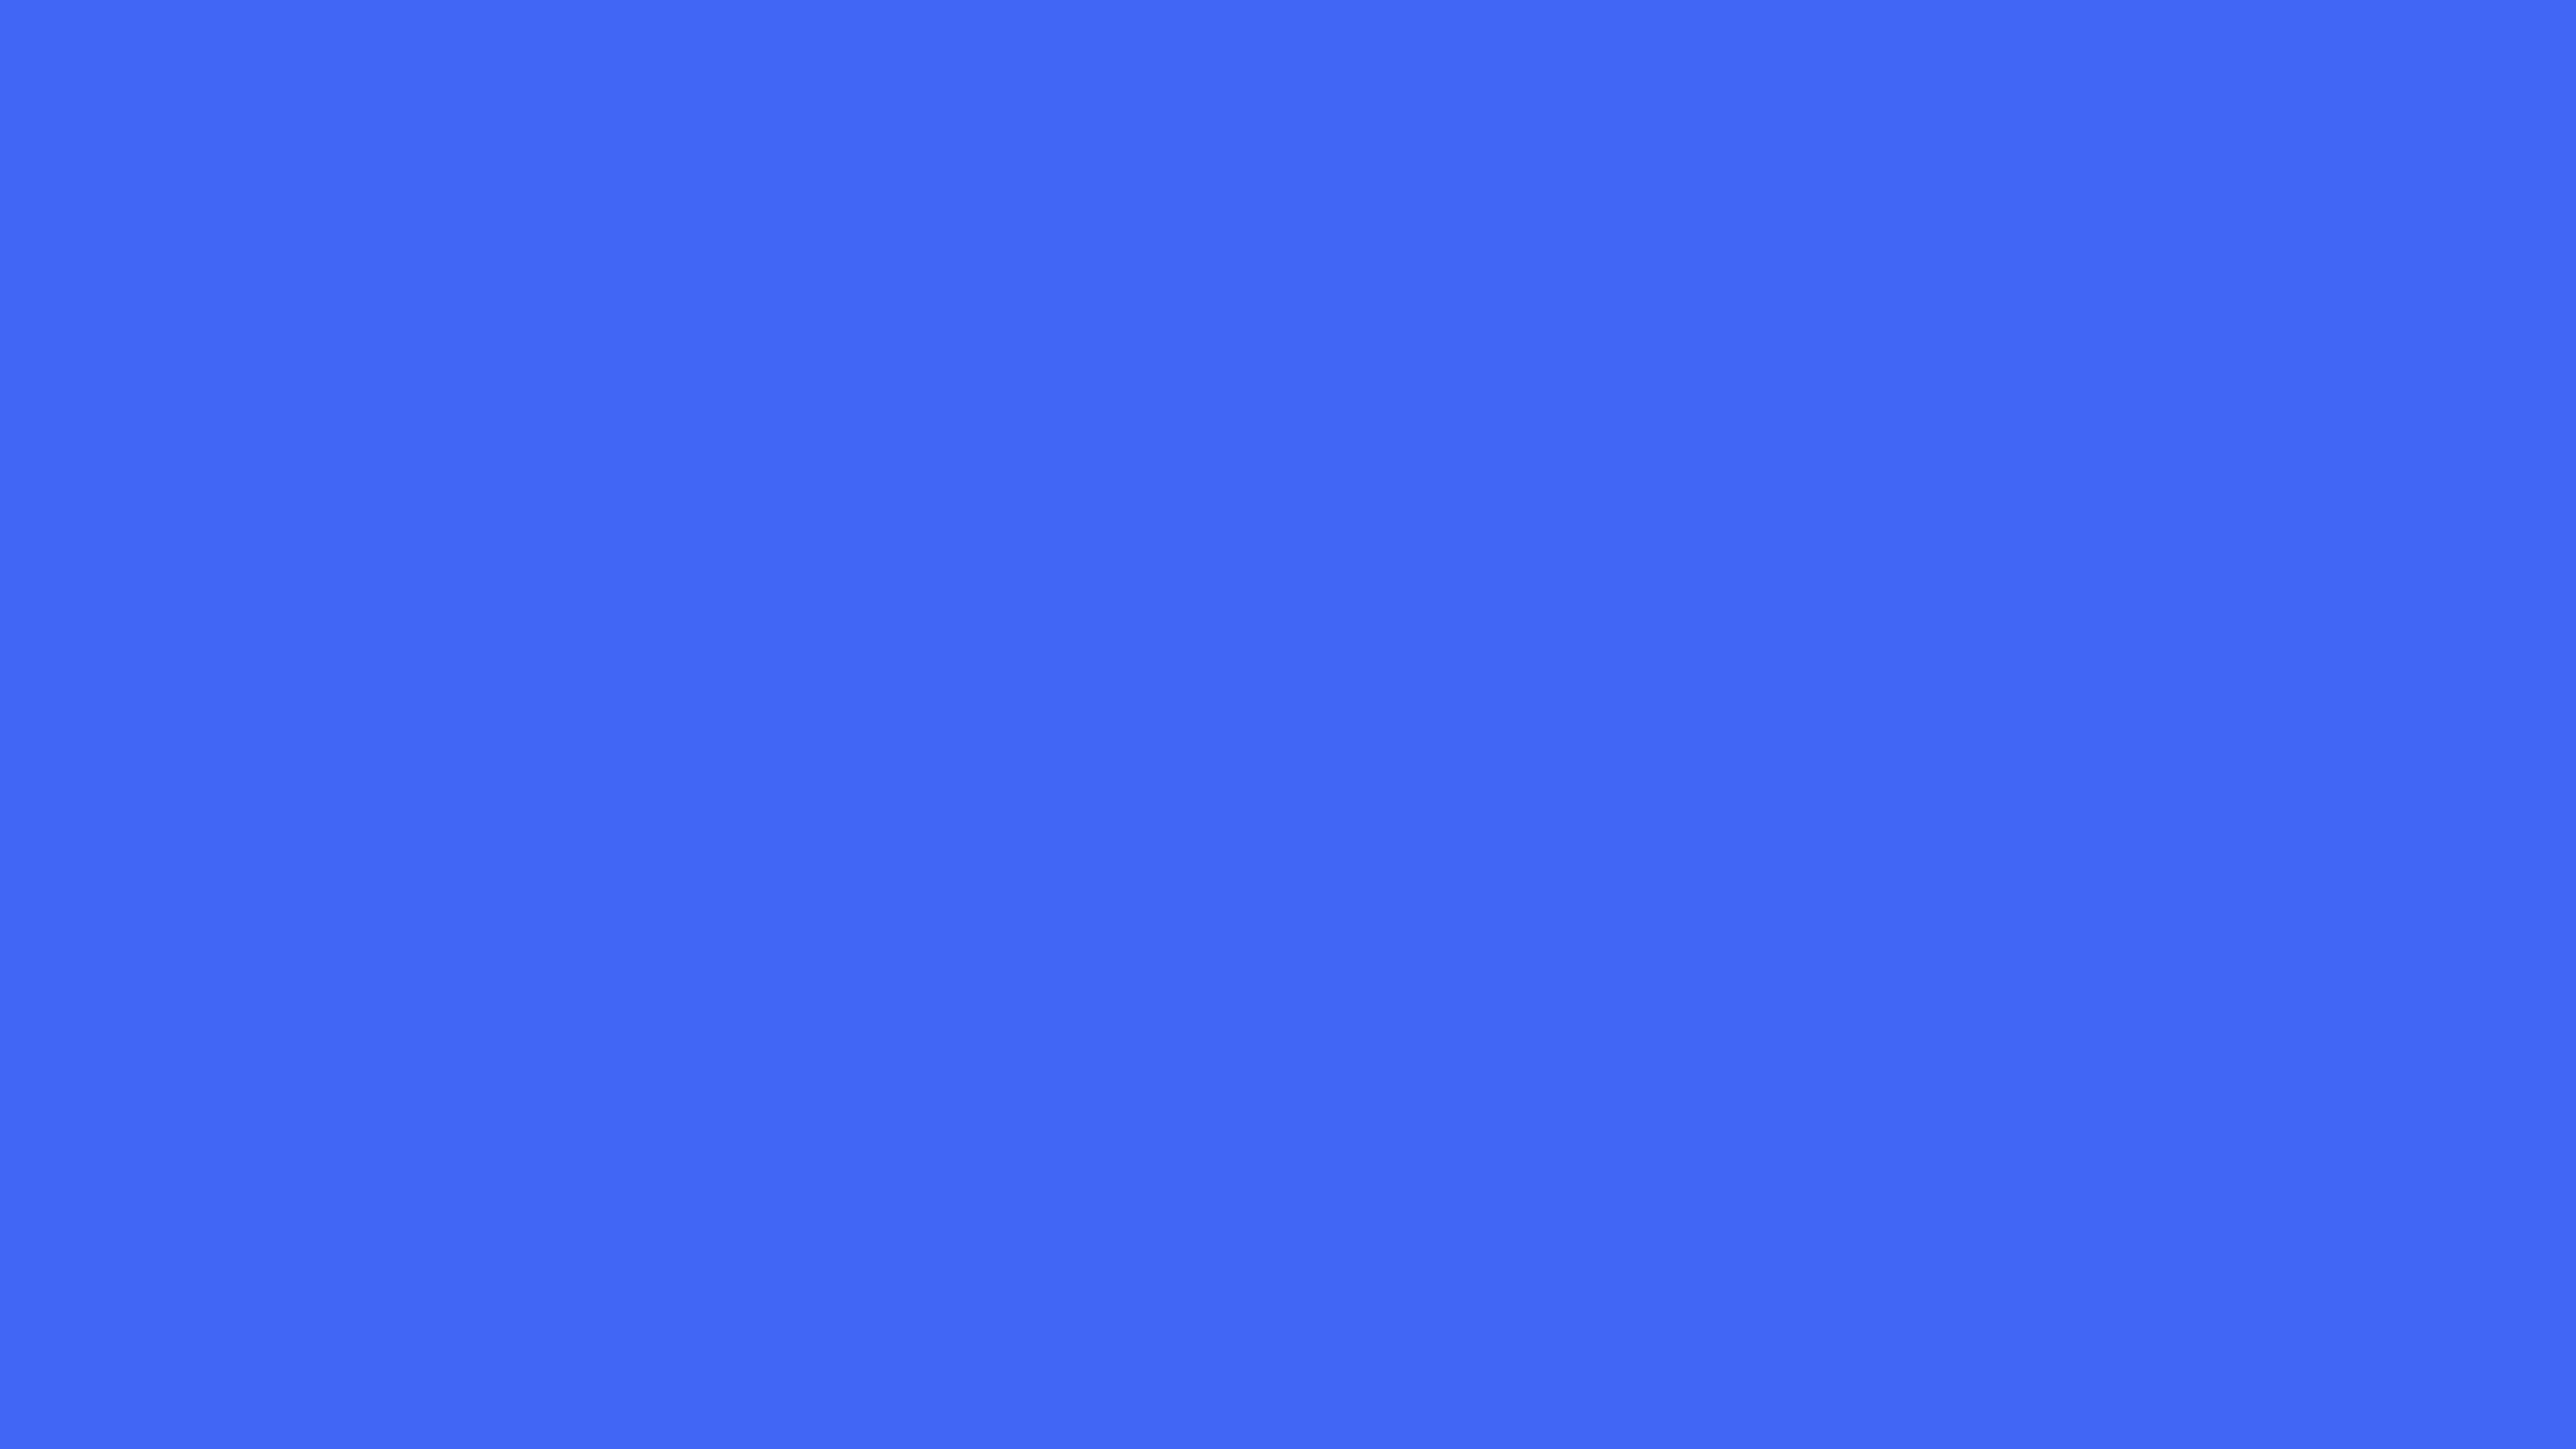 5120x2880 Ultramarine Blue Solid Color Background